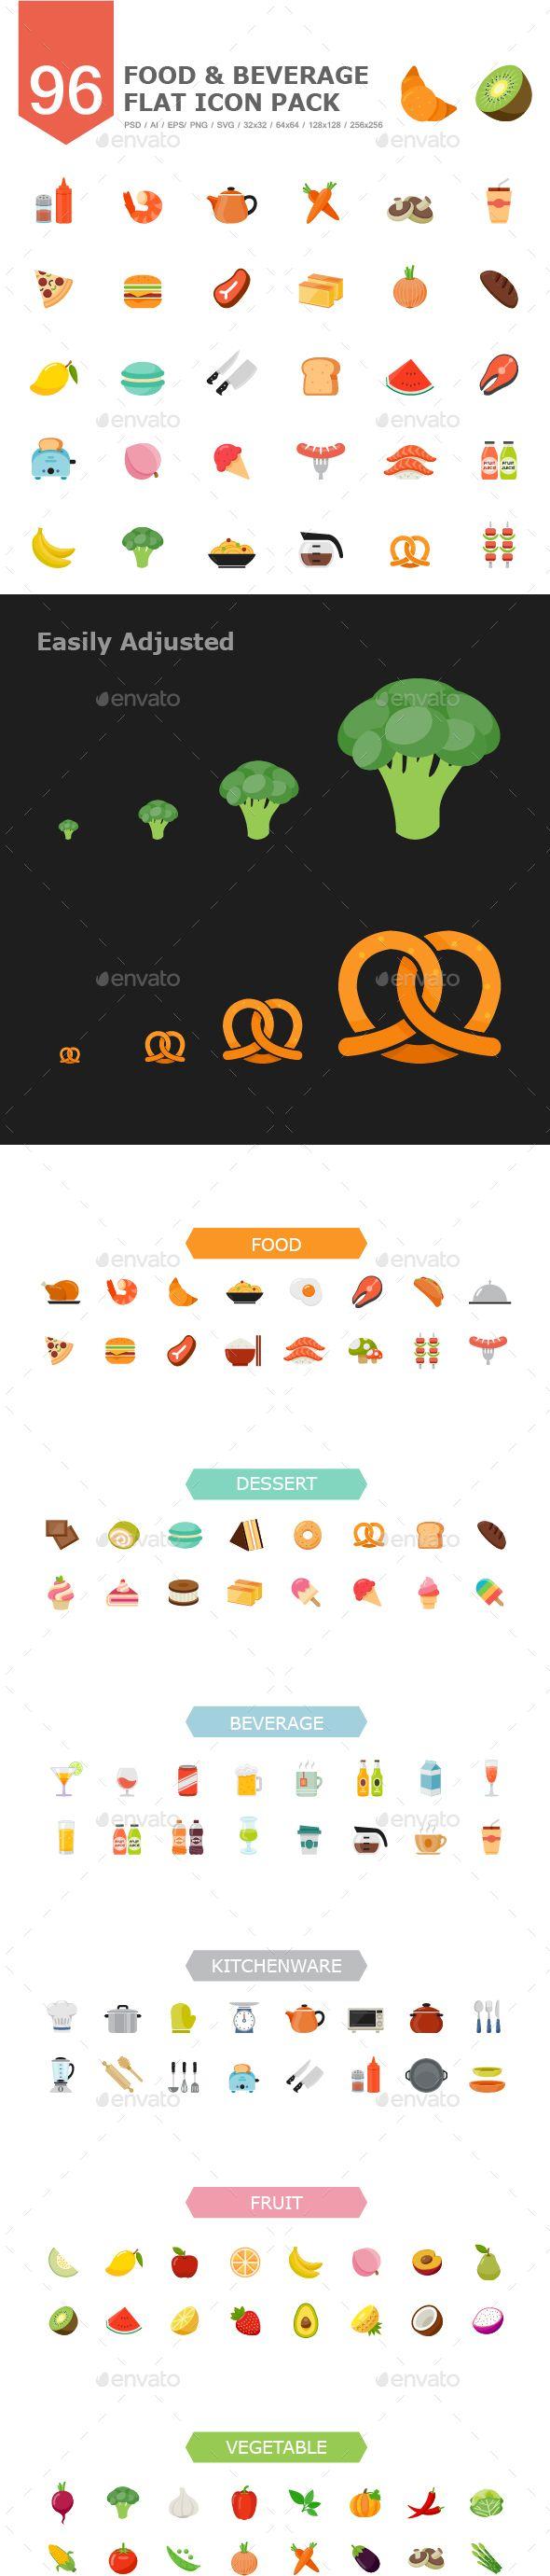 96 Food&Beverage Color Flat Icon